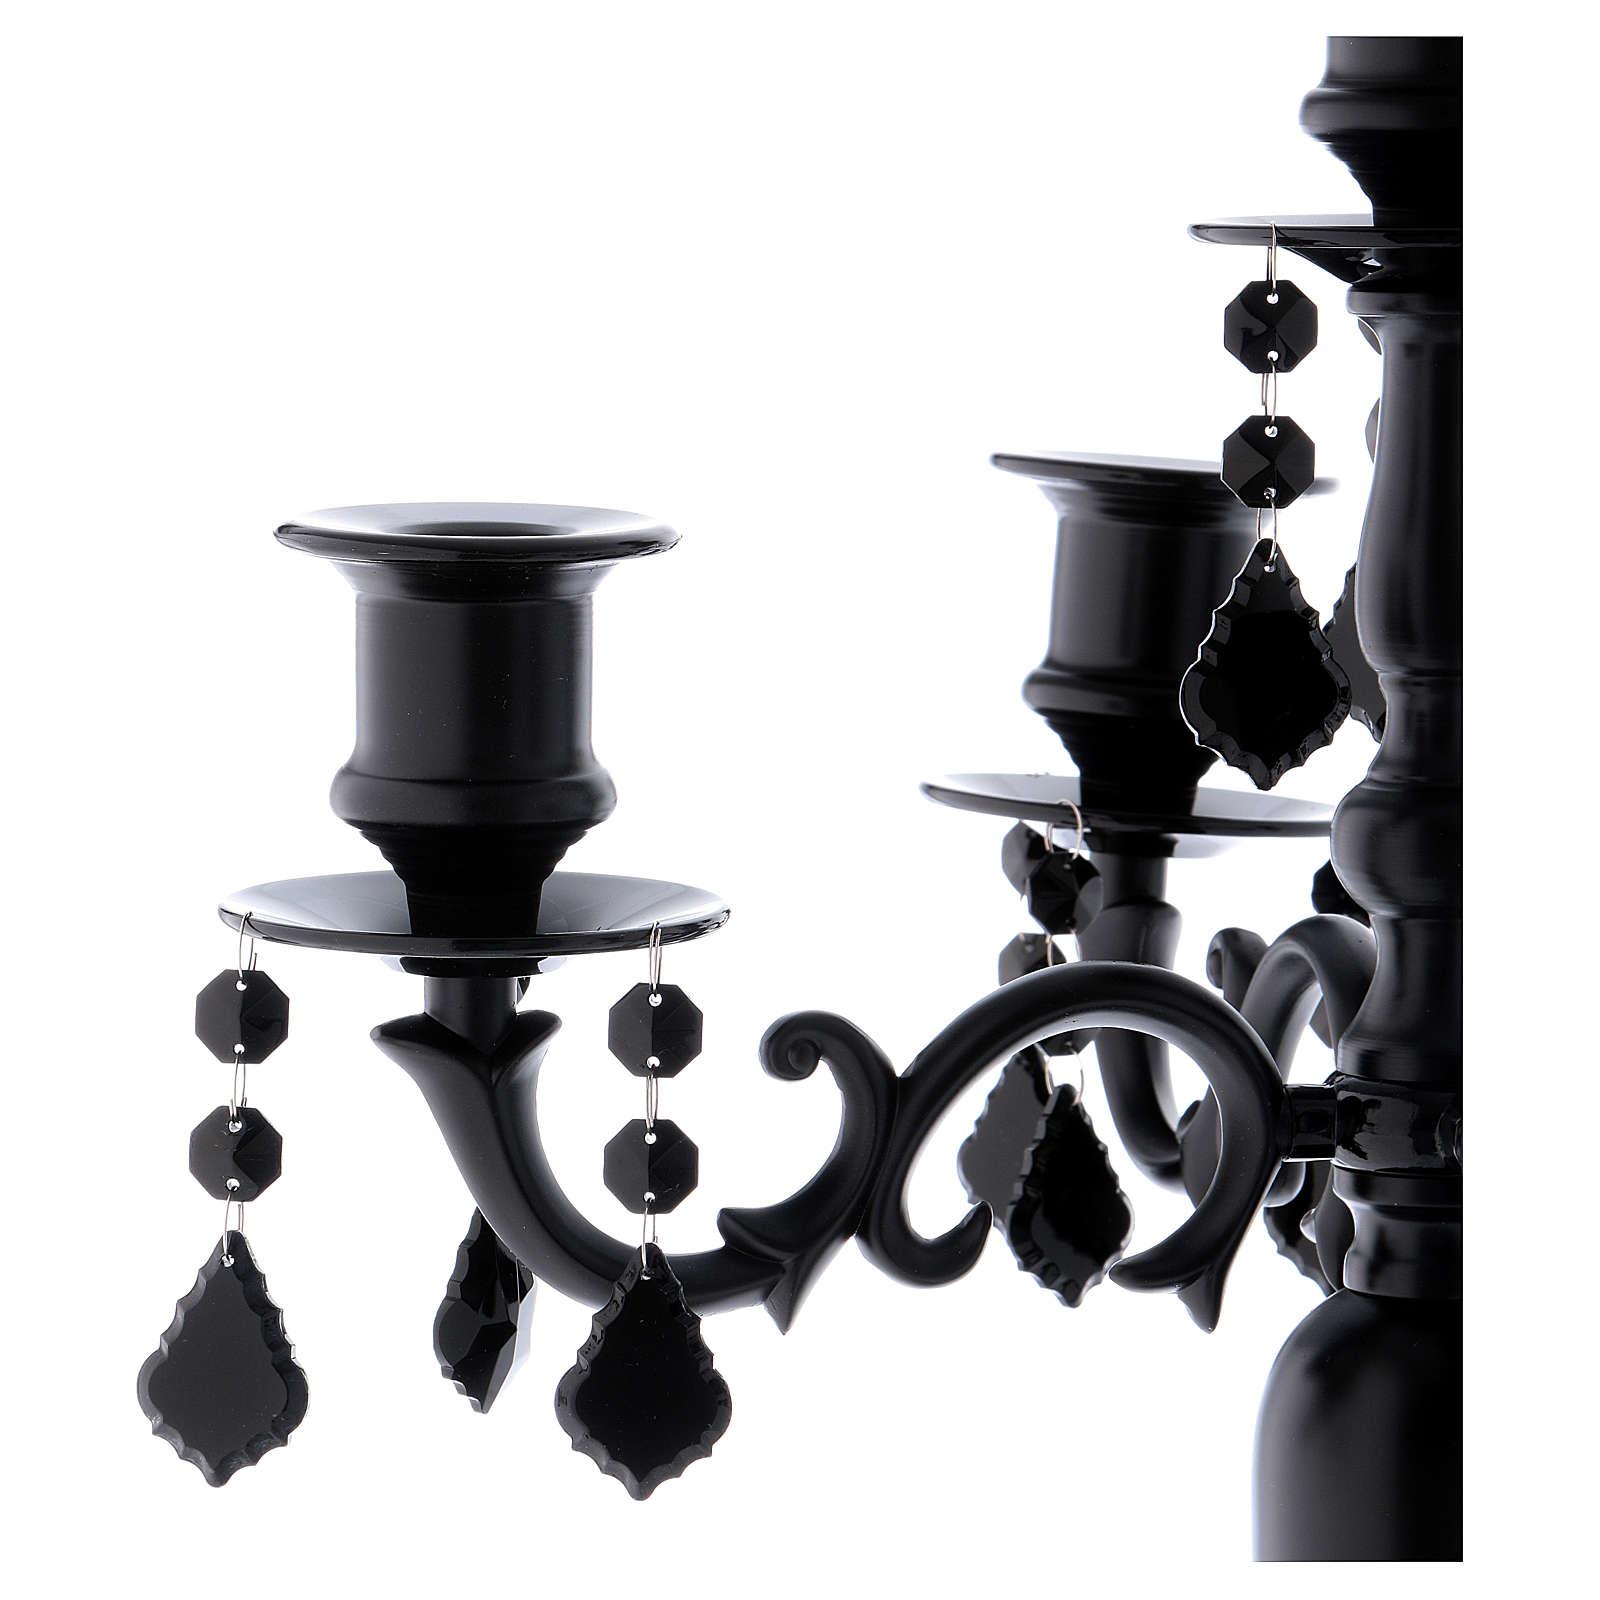 Candelabro portacandele Black 5 fiamme diam. 38 cm h. 55 cm 4